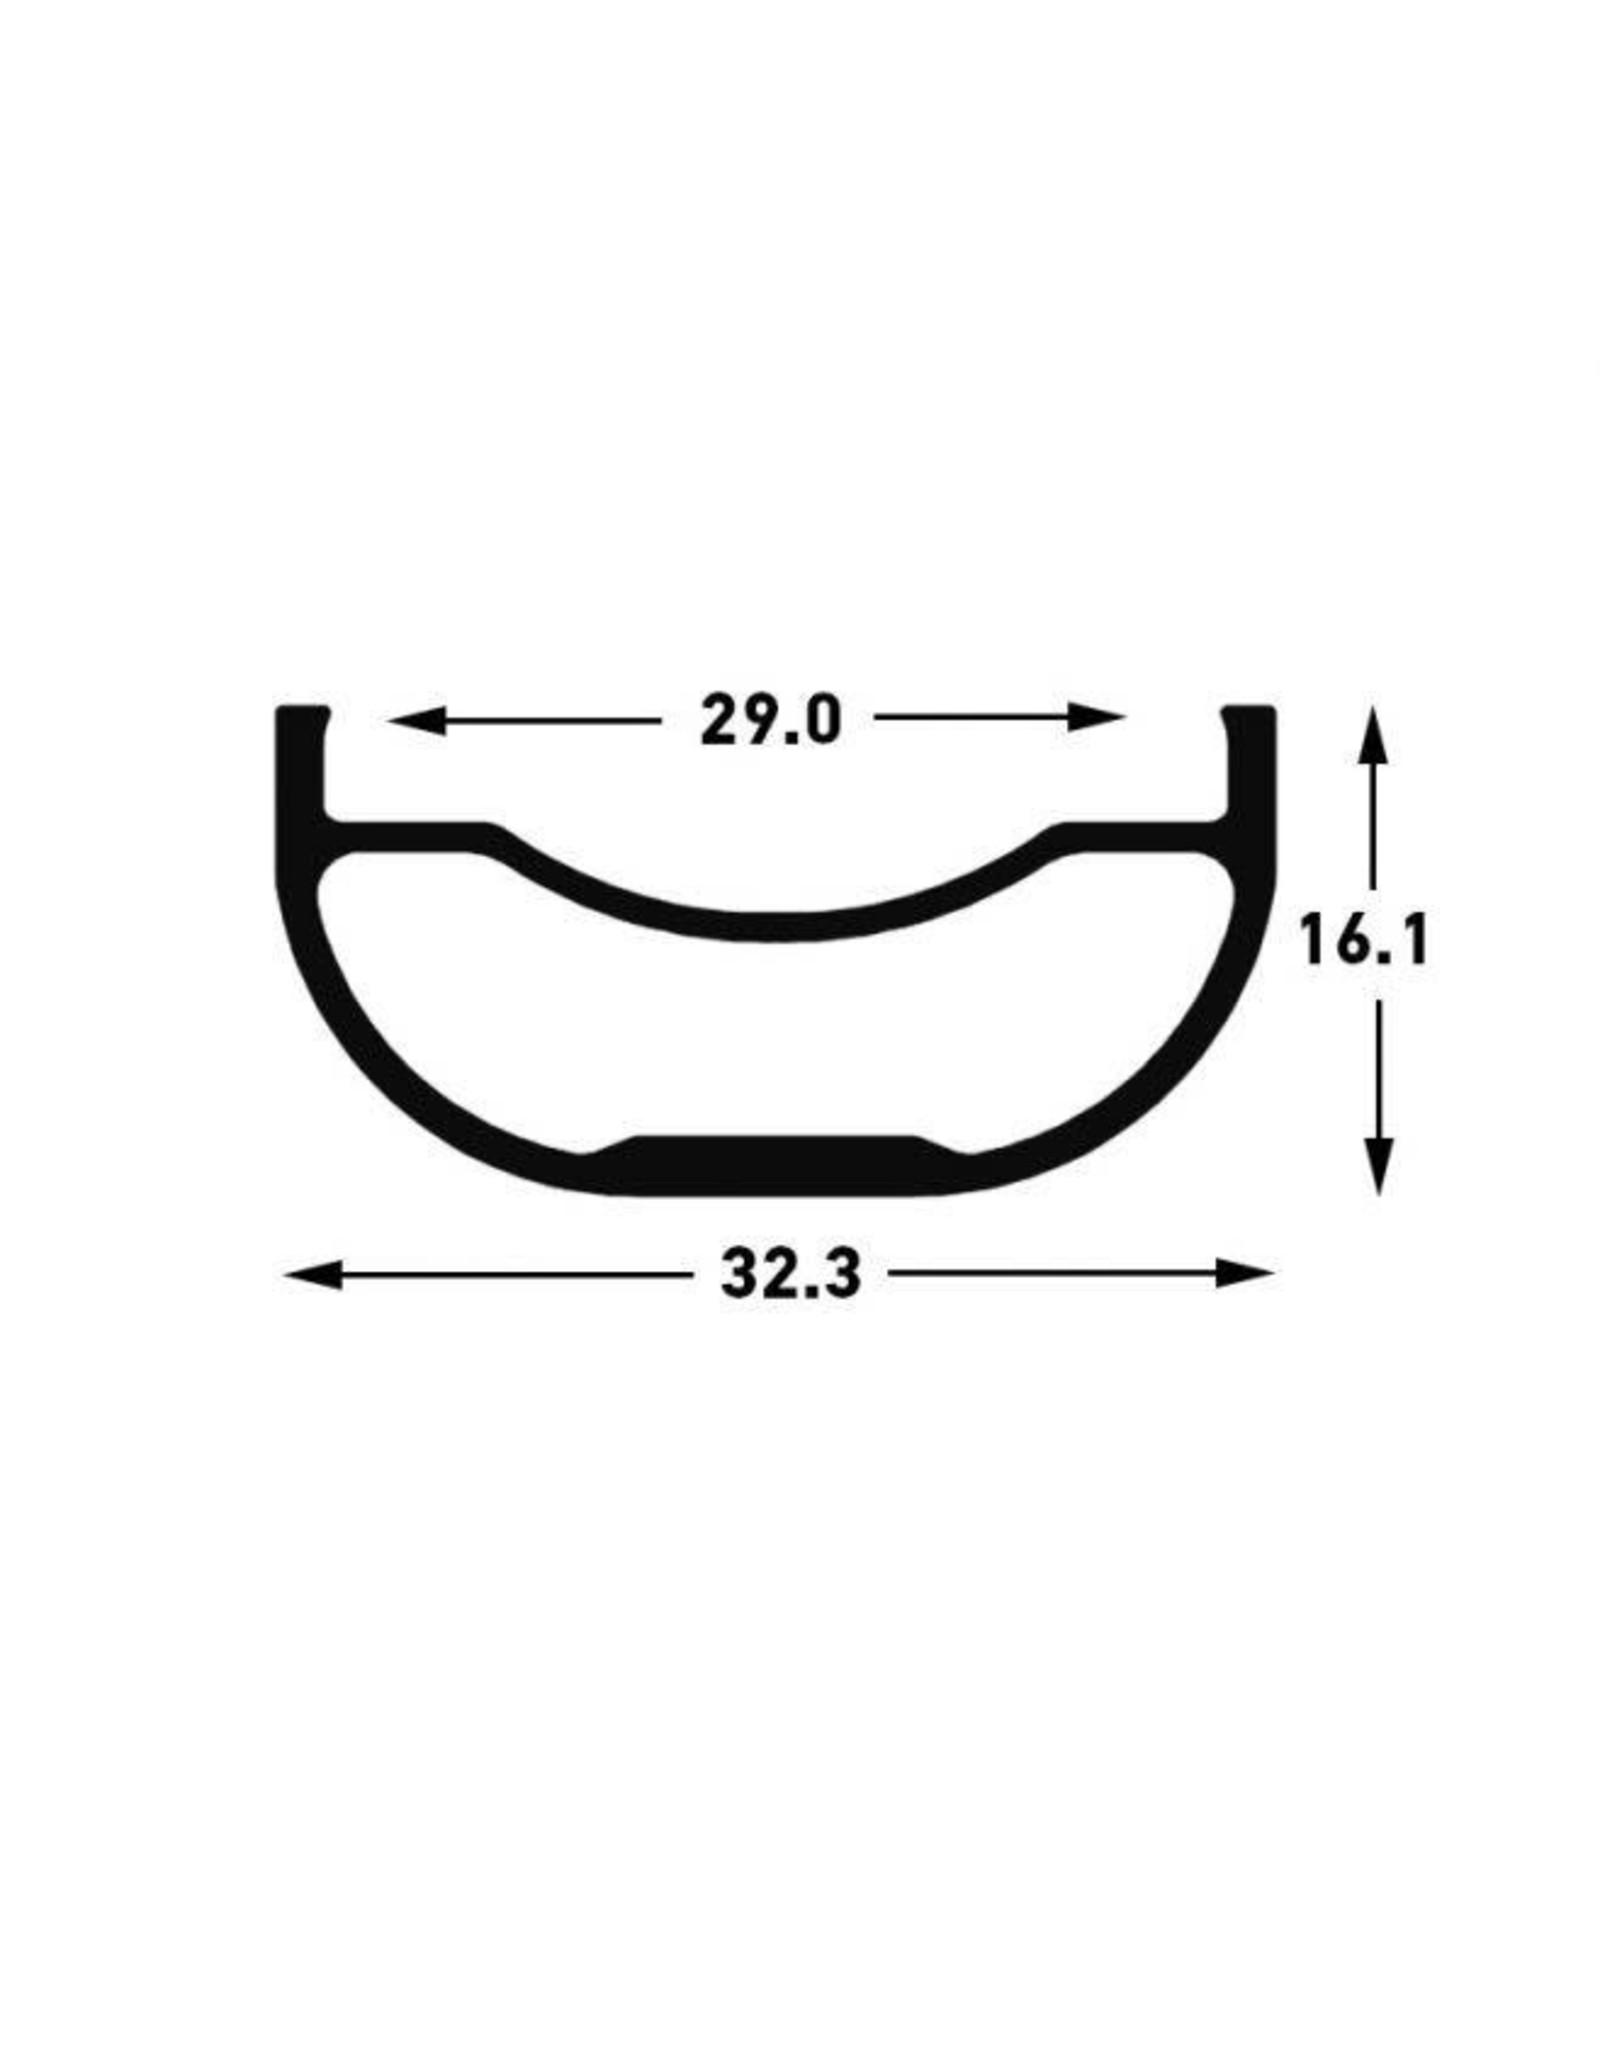 Stan's No-Tubes Stans No Tubes Flow MK3, 28H, 29, Black